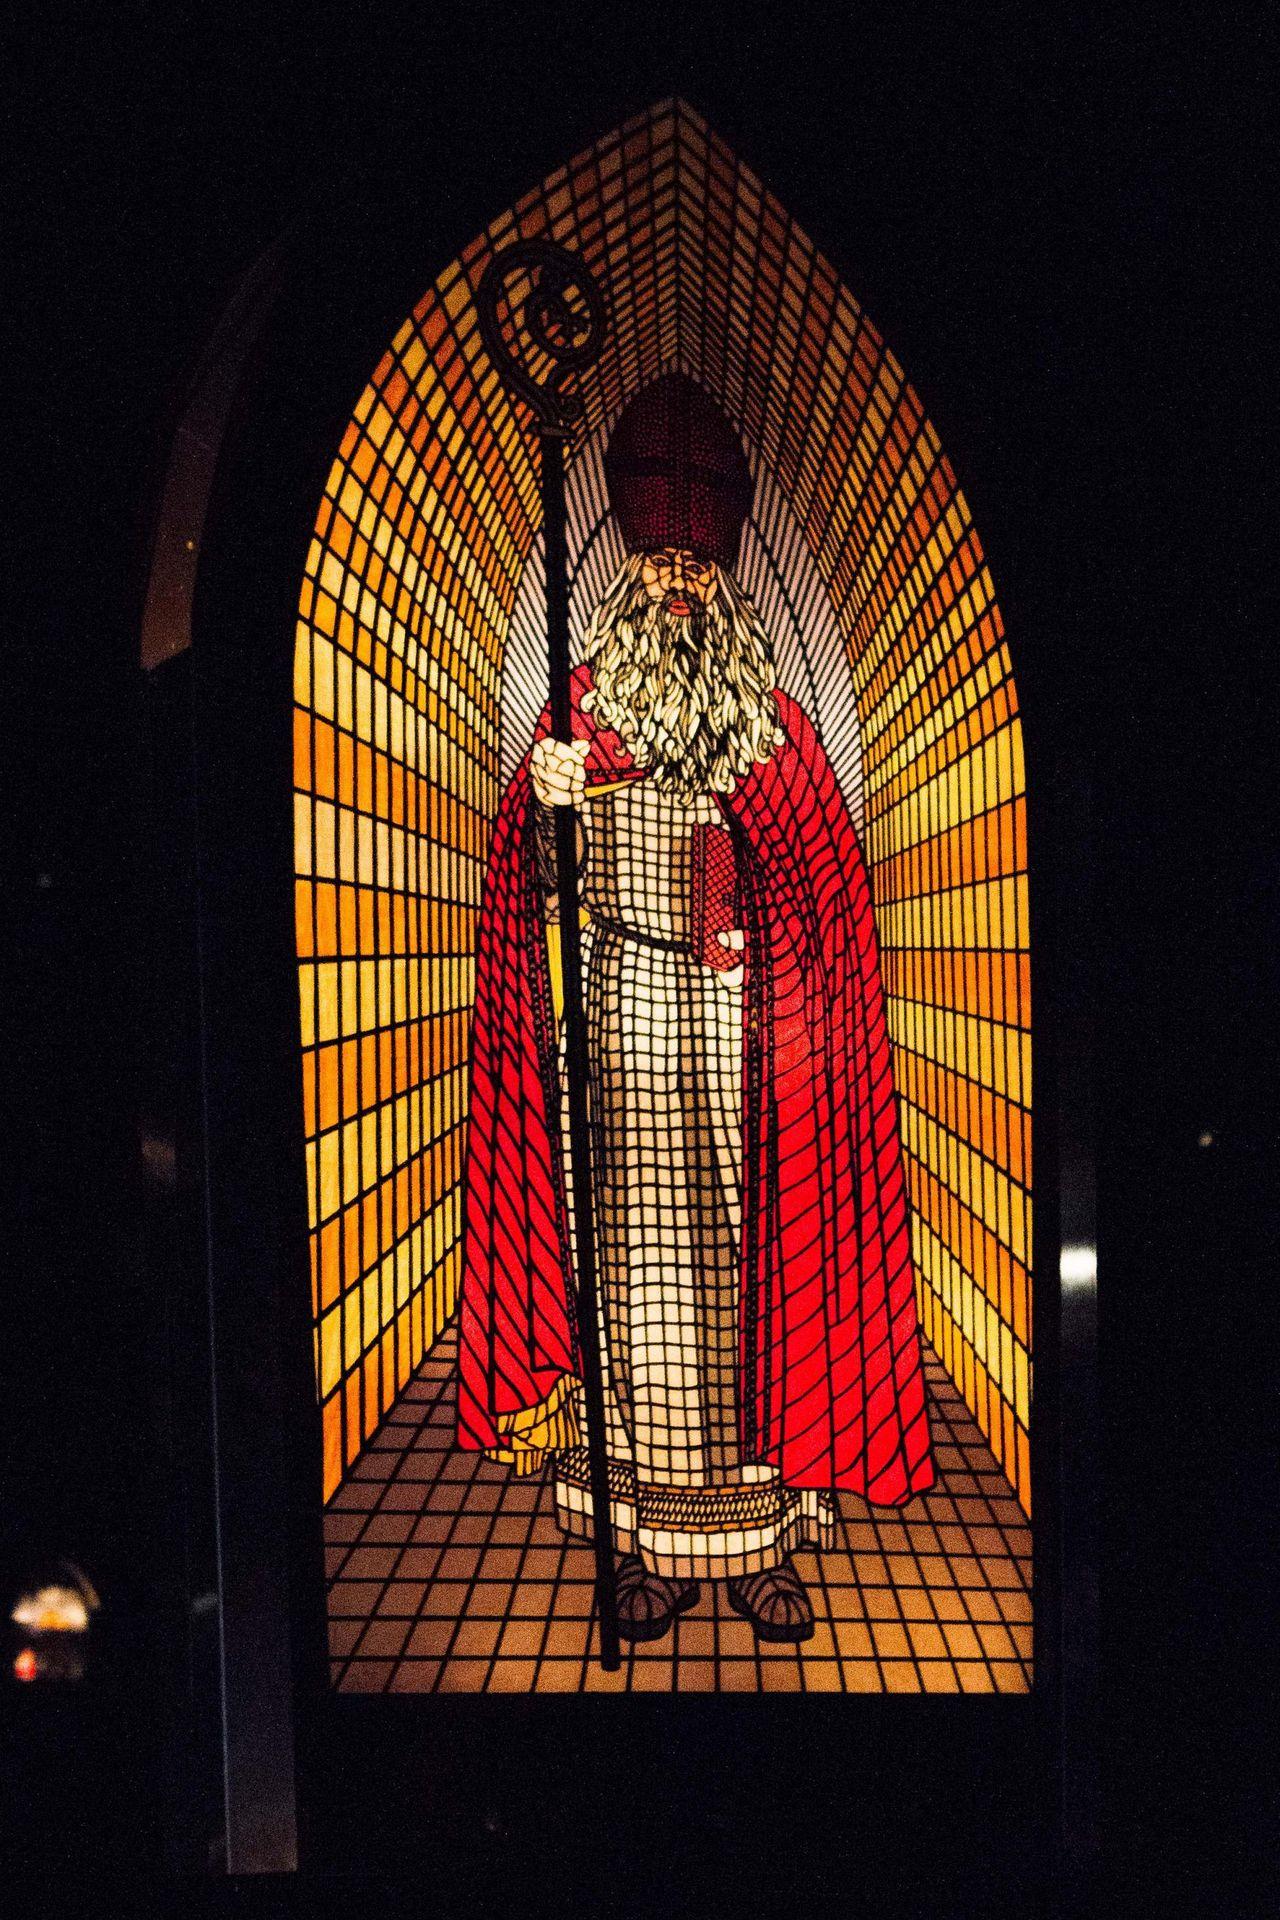 St. Nicholas processions